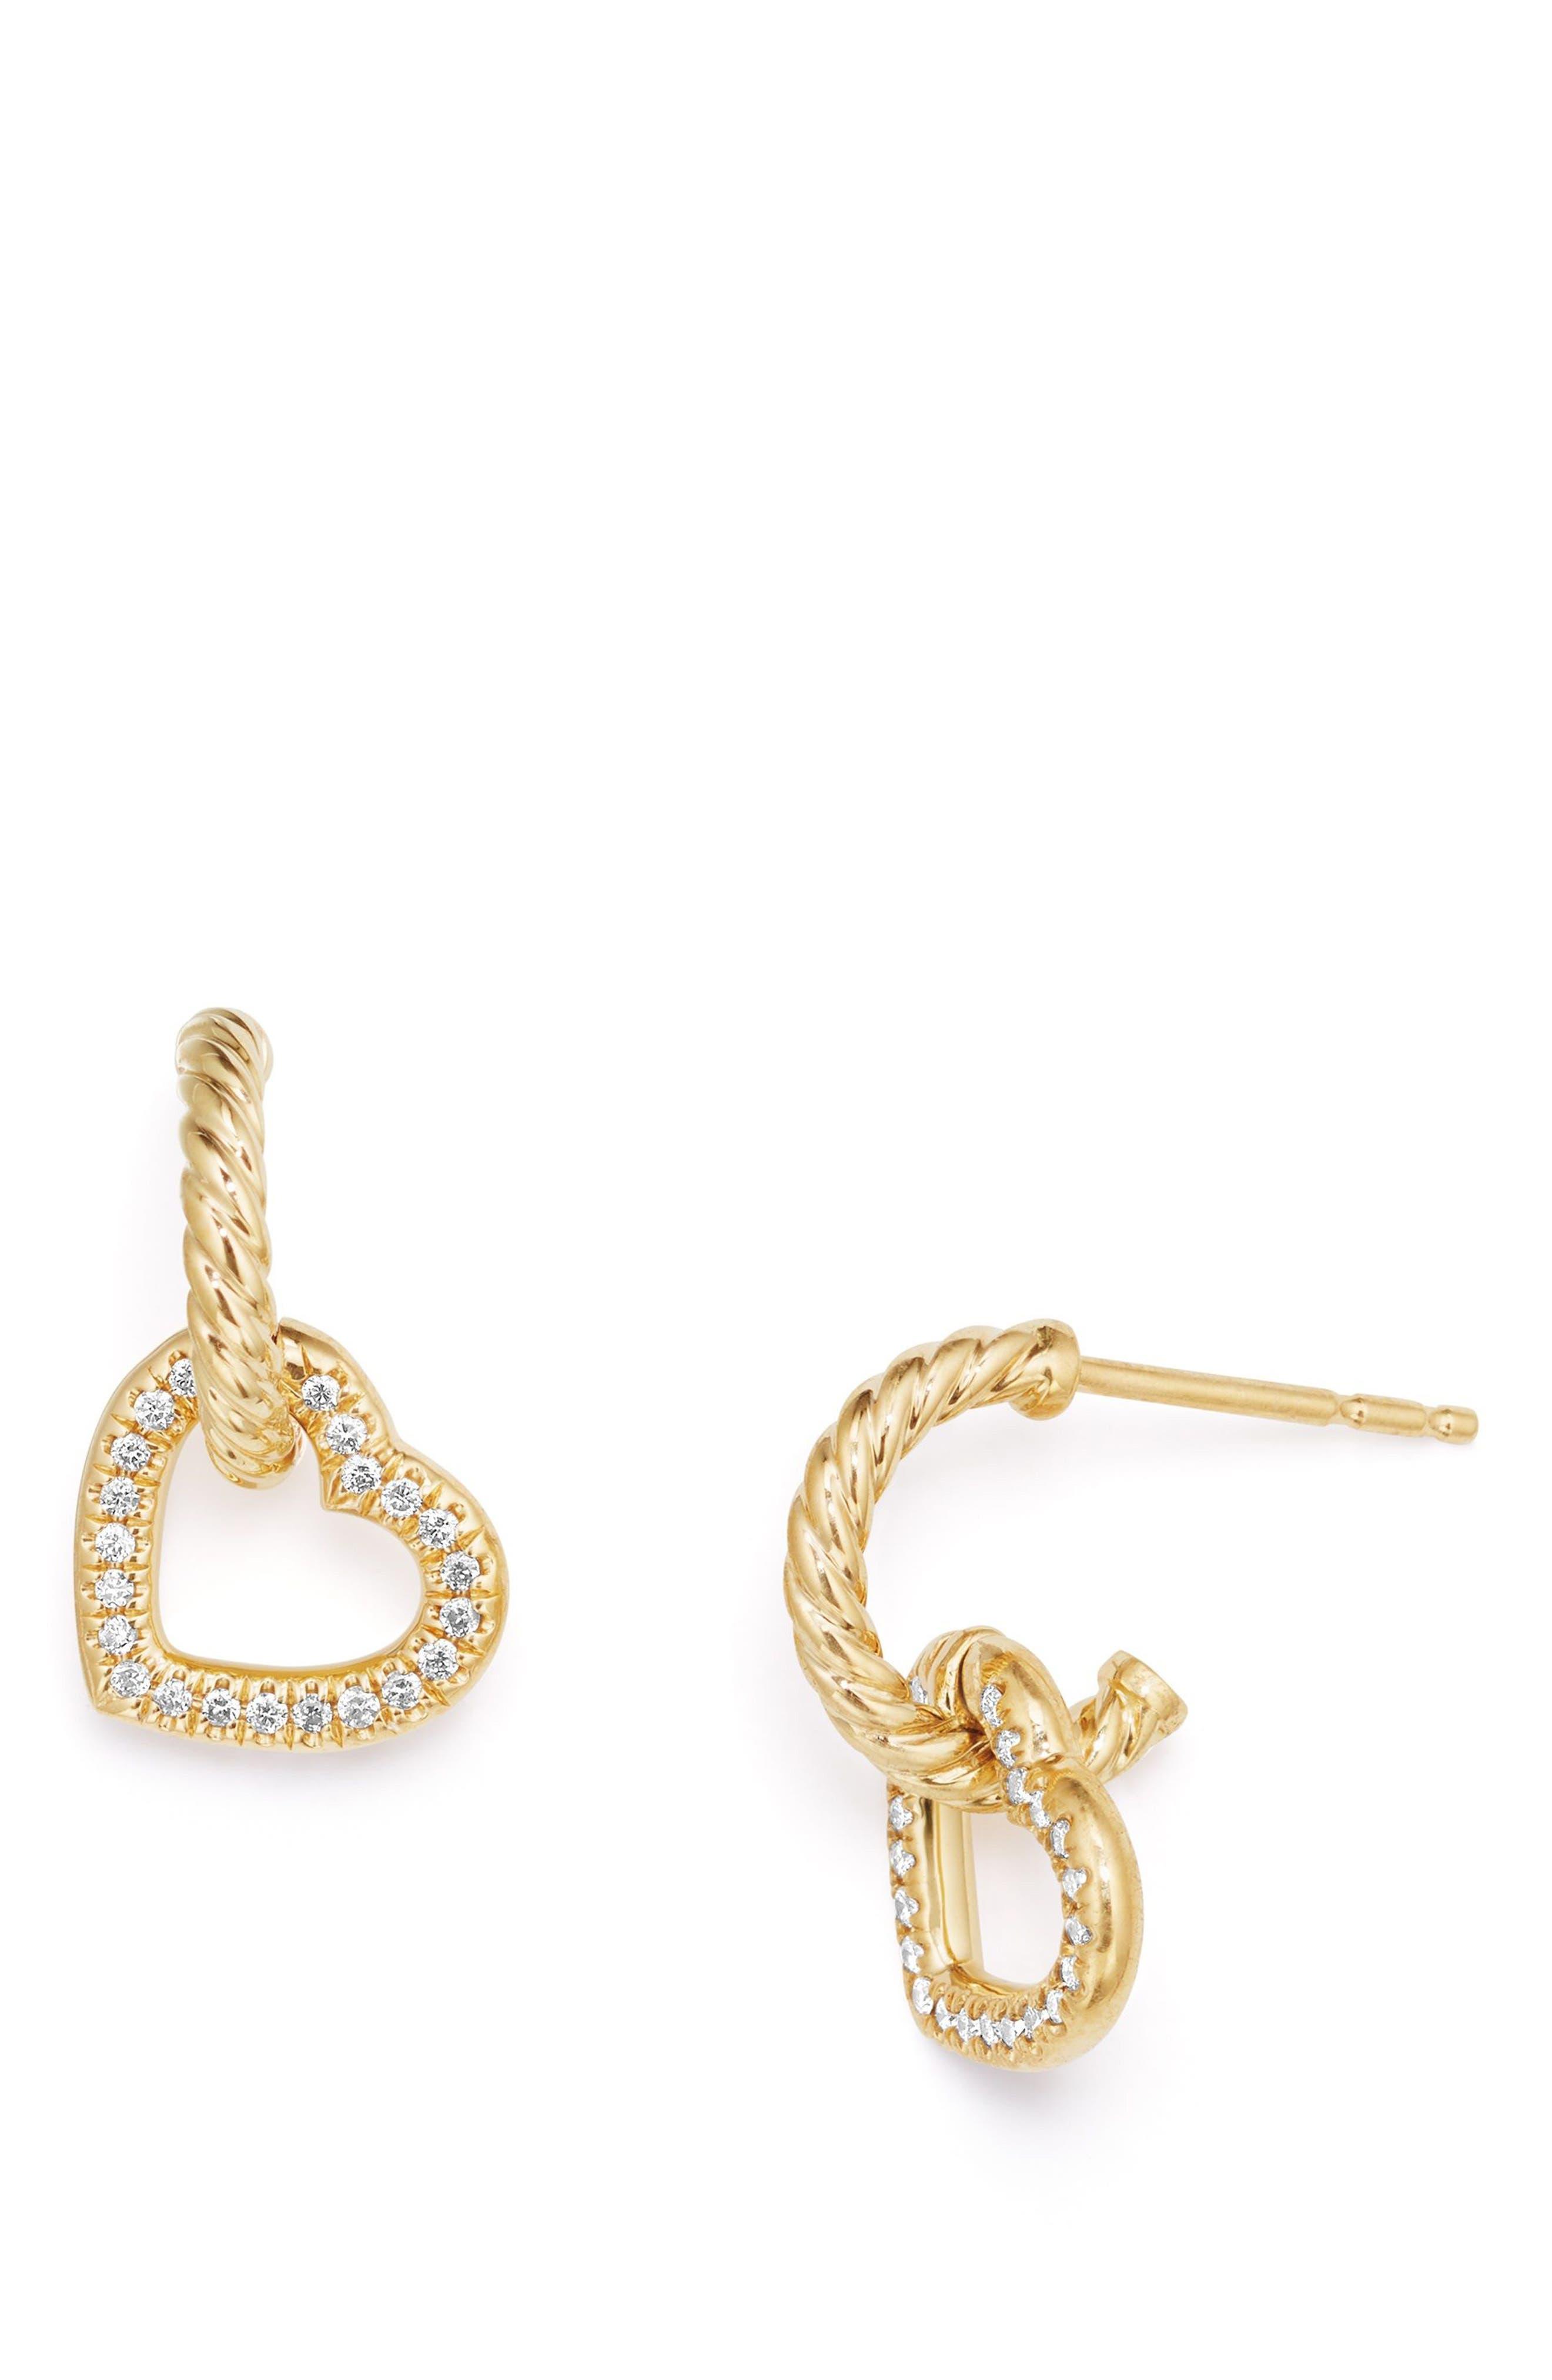 DAVID YURMAN, Heart Drop Earrings with Diamonds in 18K Gold, Main thumbnail 1, color, GOLD